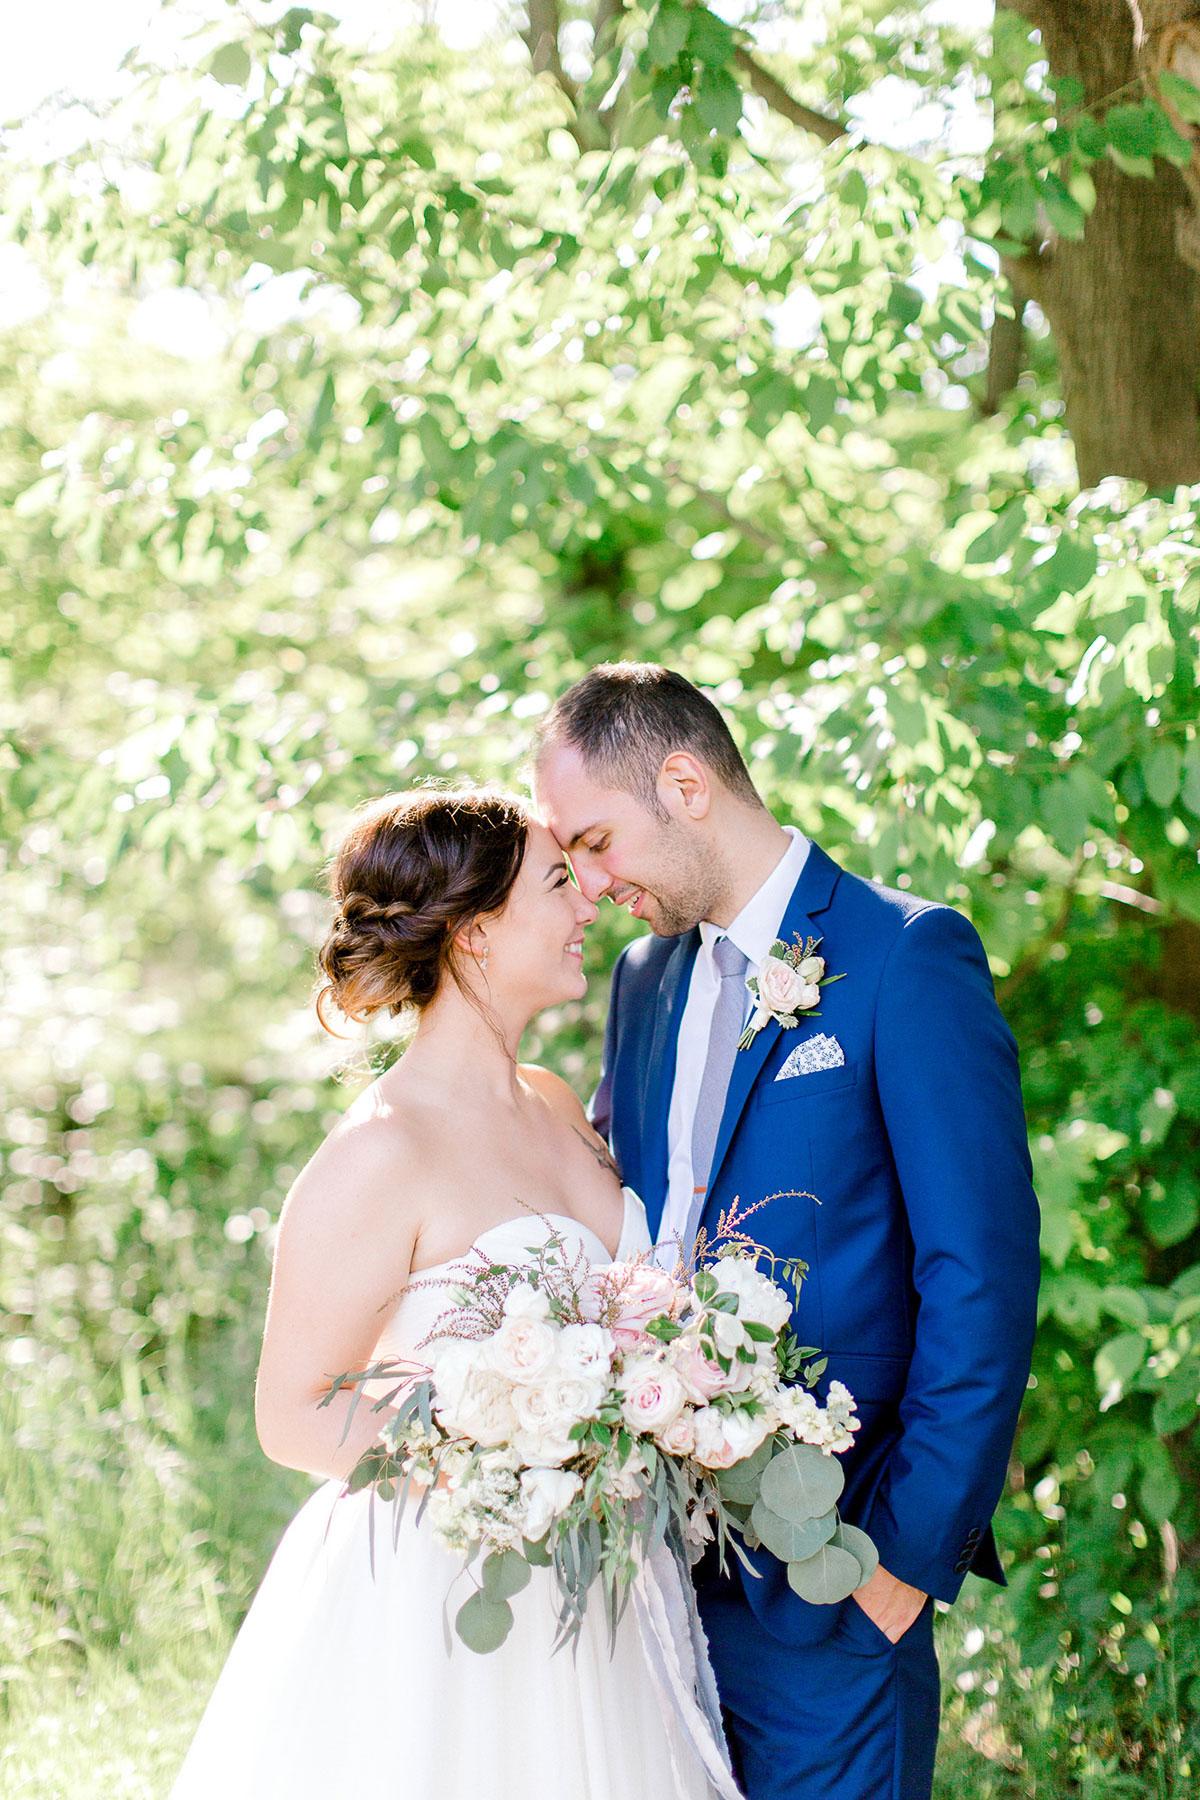 beatrice-elford-photography-vineyard-bride-swish-list-balls-falls-vineland-wedding-37.jpg